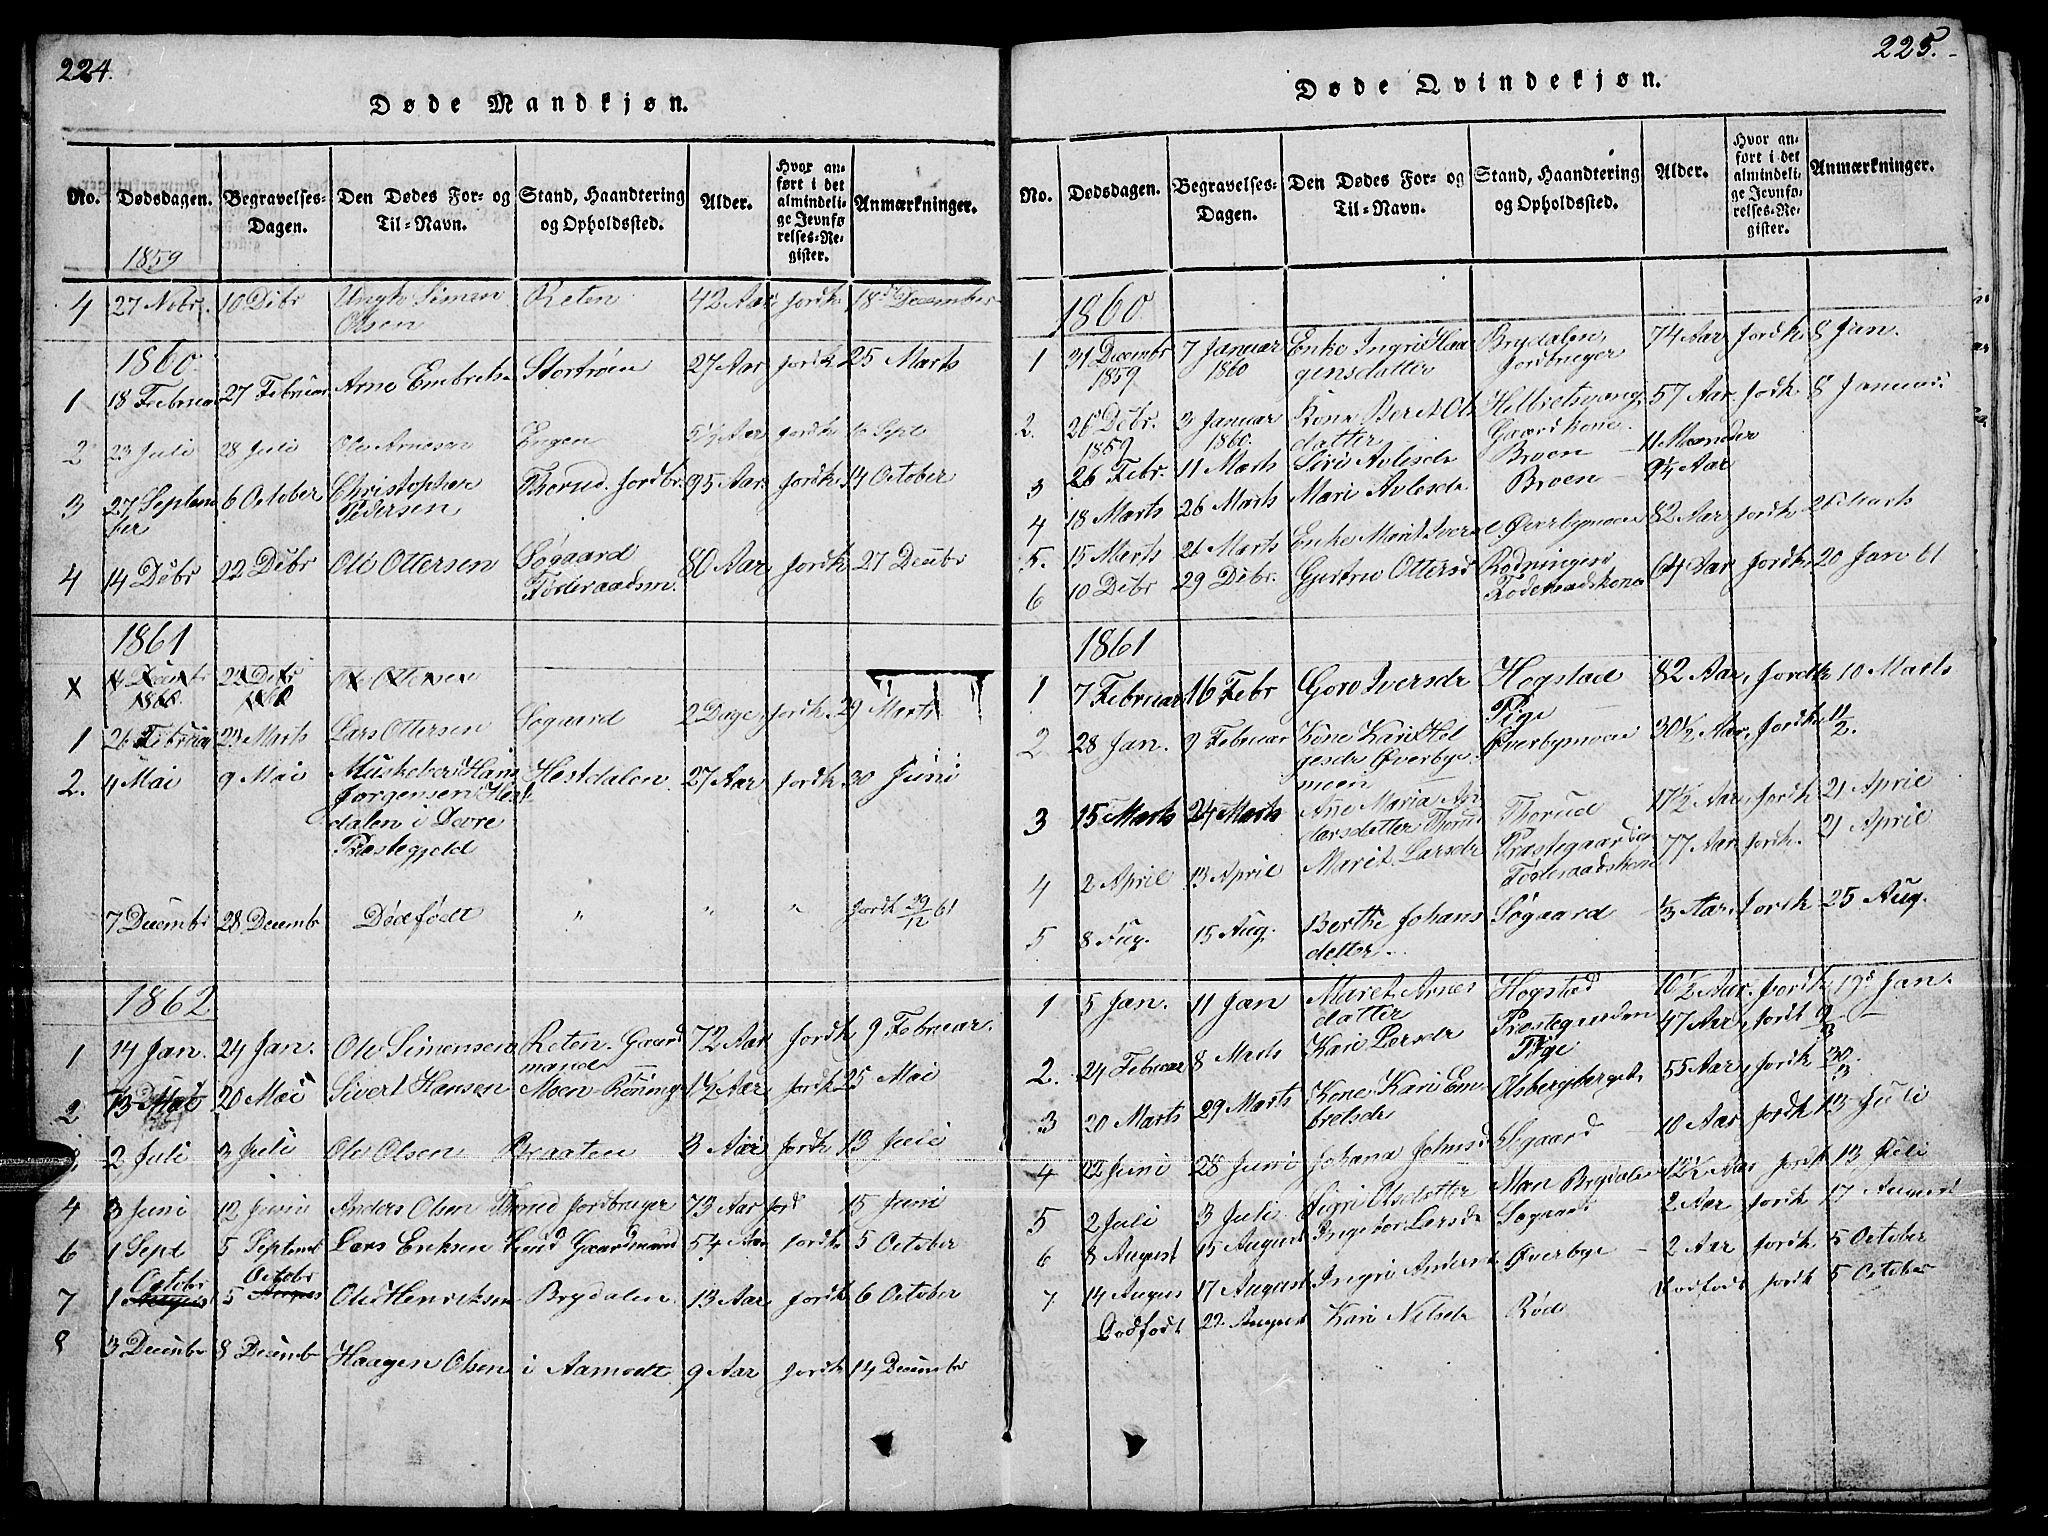 SAH, Tynset prestekontor, Klokkerbok nr. 4, 1814-1879, s. 224-225